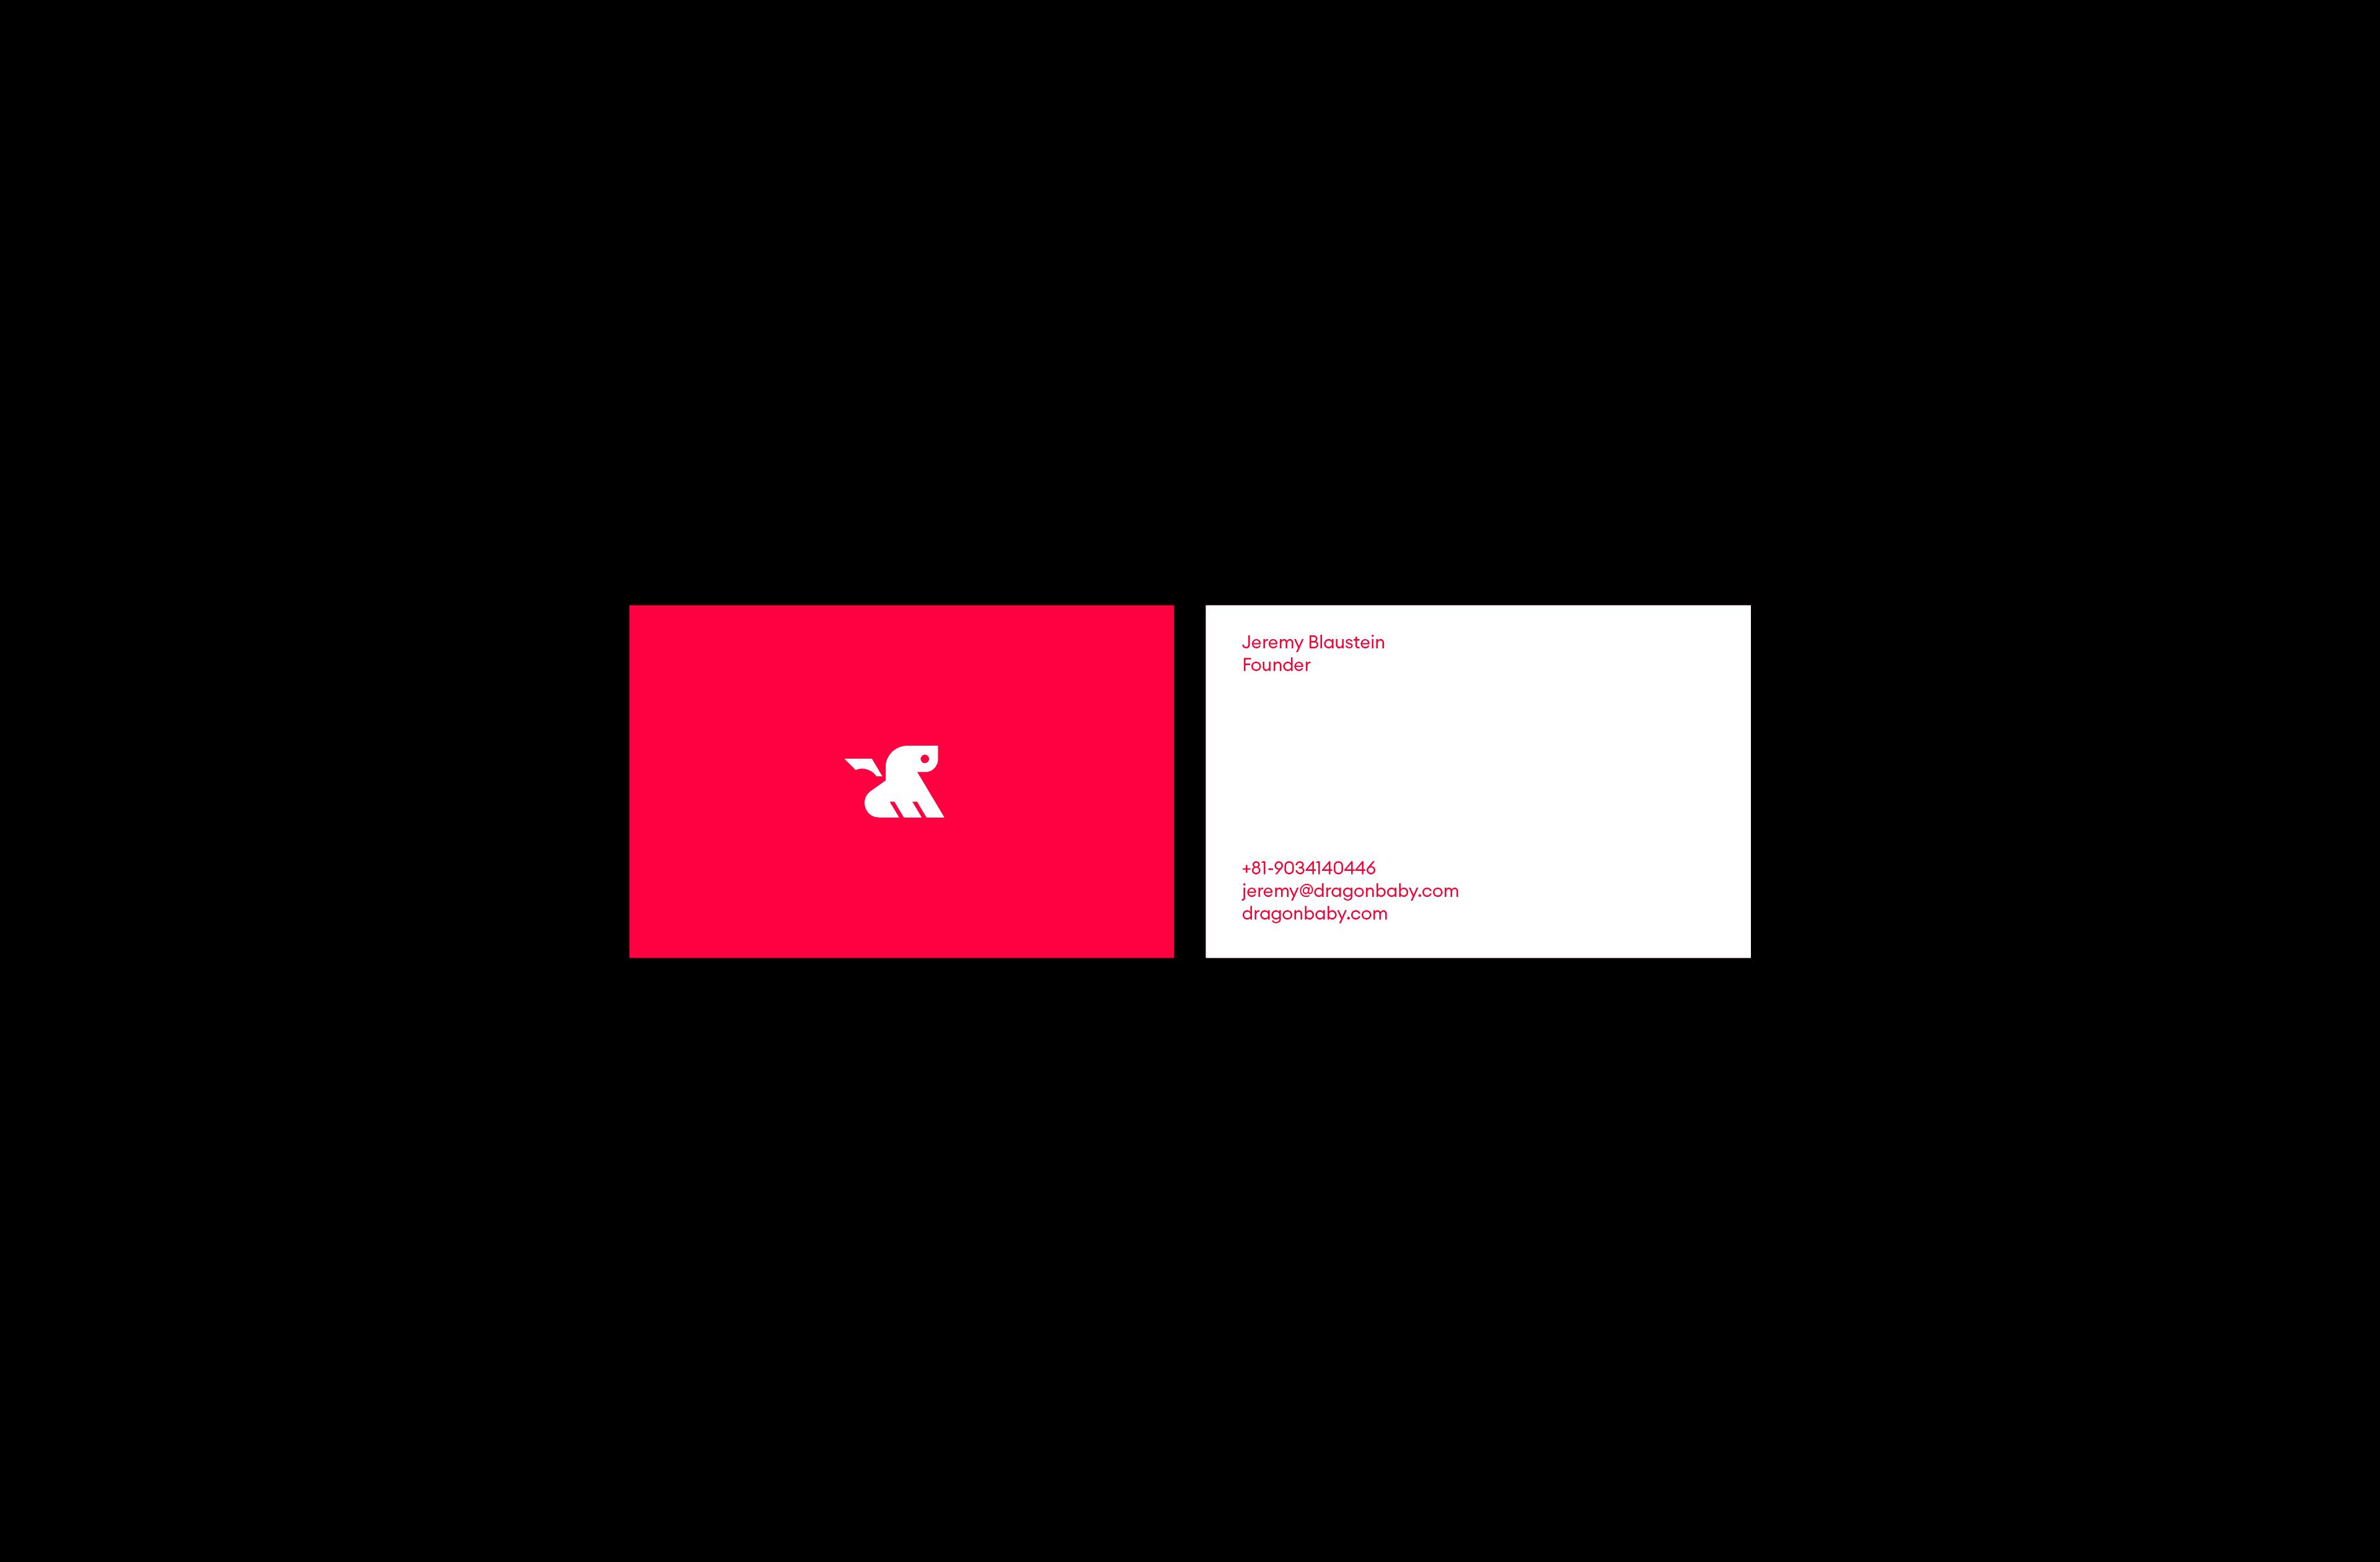 Dragonbaby-cards-2x